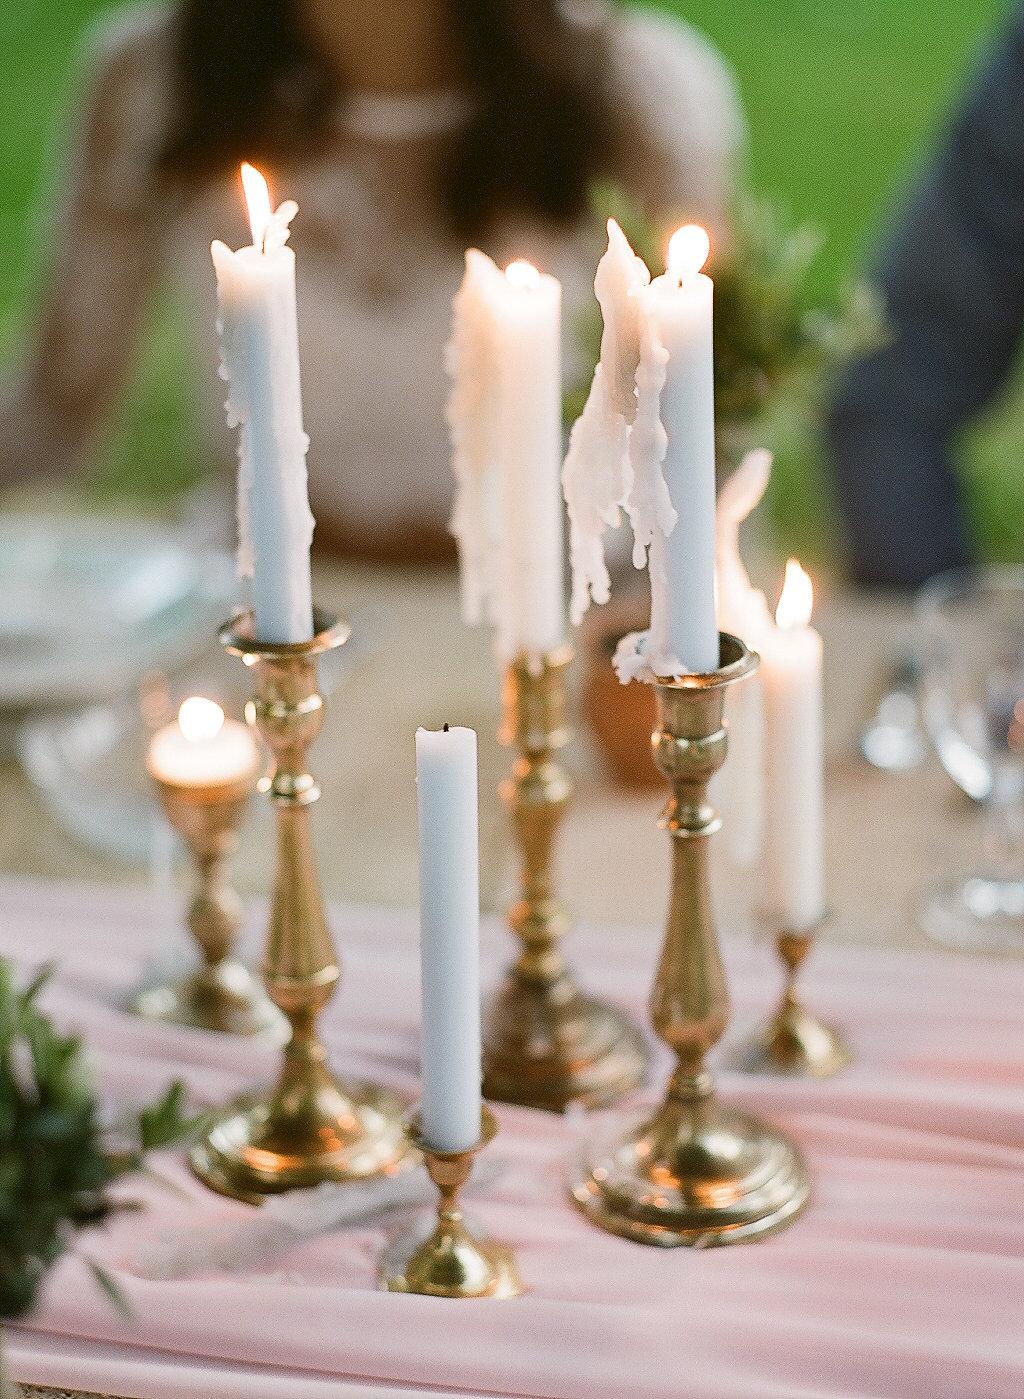 le coeur dans les etoiles - wedding planner - provence - luberon - alpilles - drome - vaucluse - sardaigne - italie - organisation - mariage - shooting - dolce vita - valery villard-404